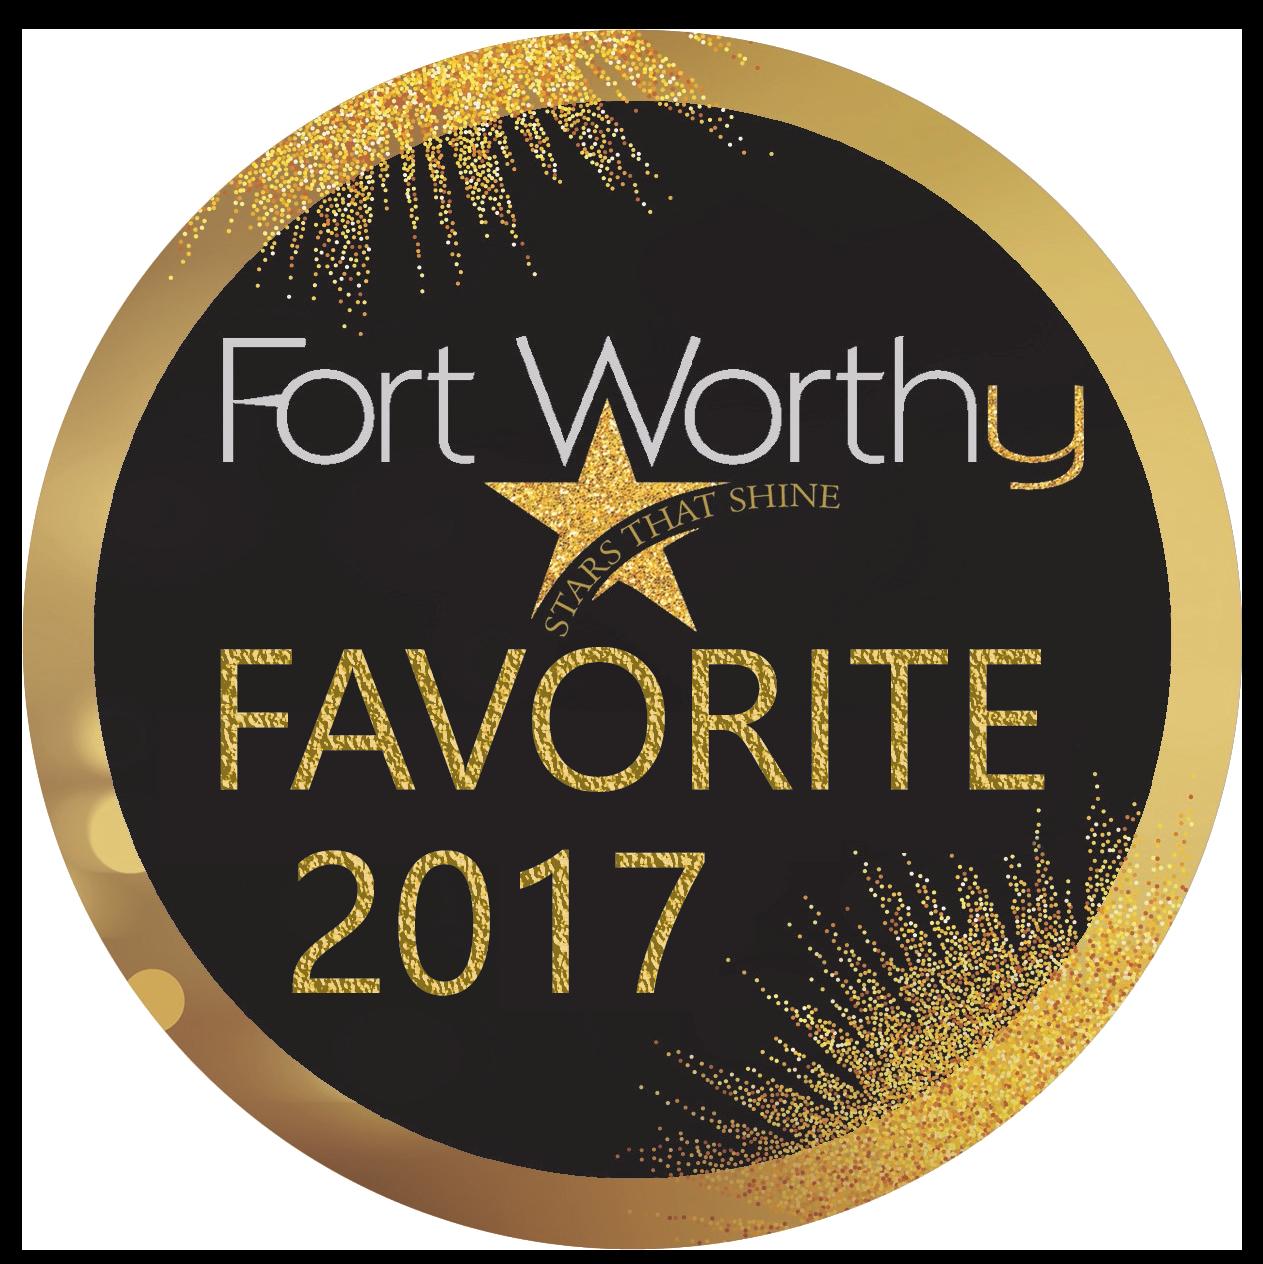 Fort worth Star Favorite 2017 Sticker.png